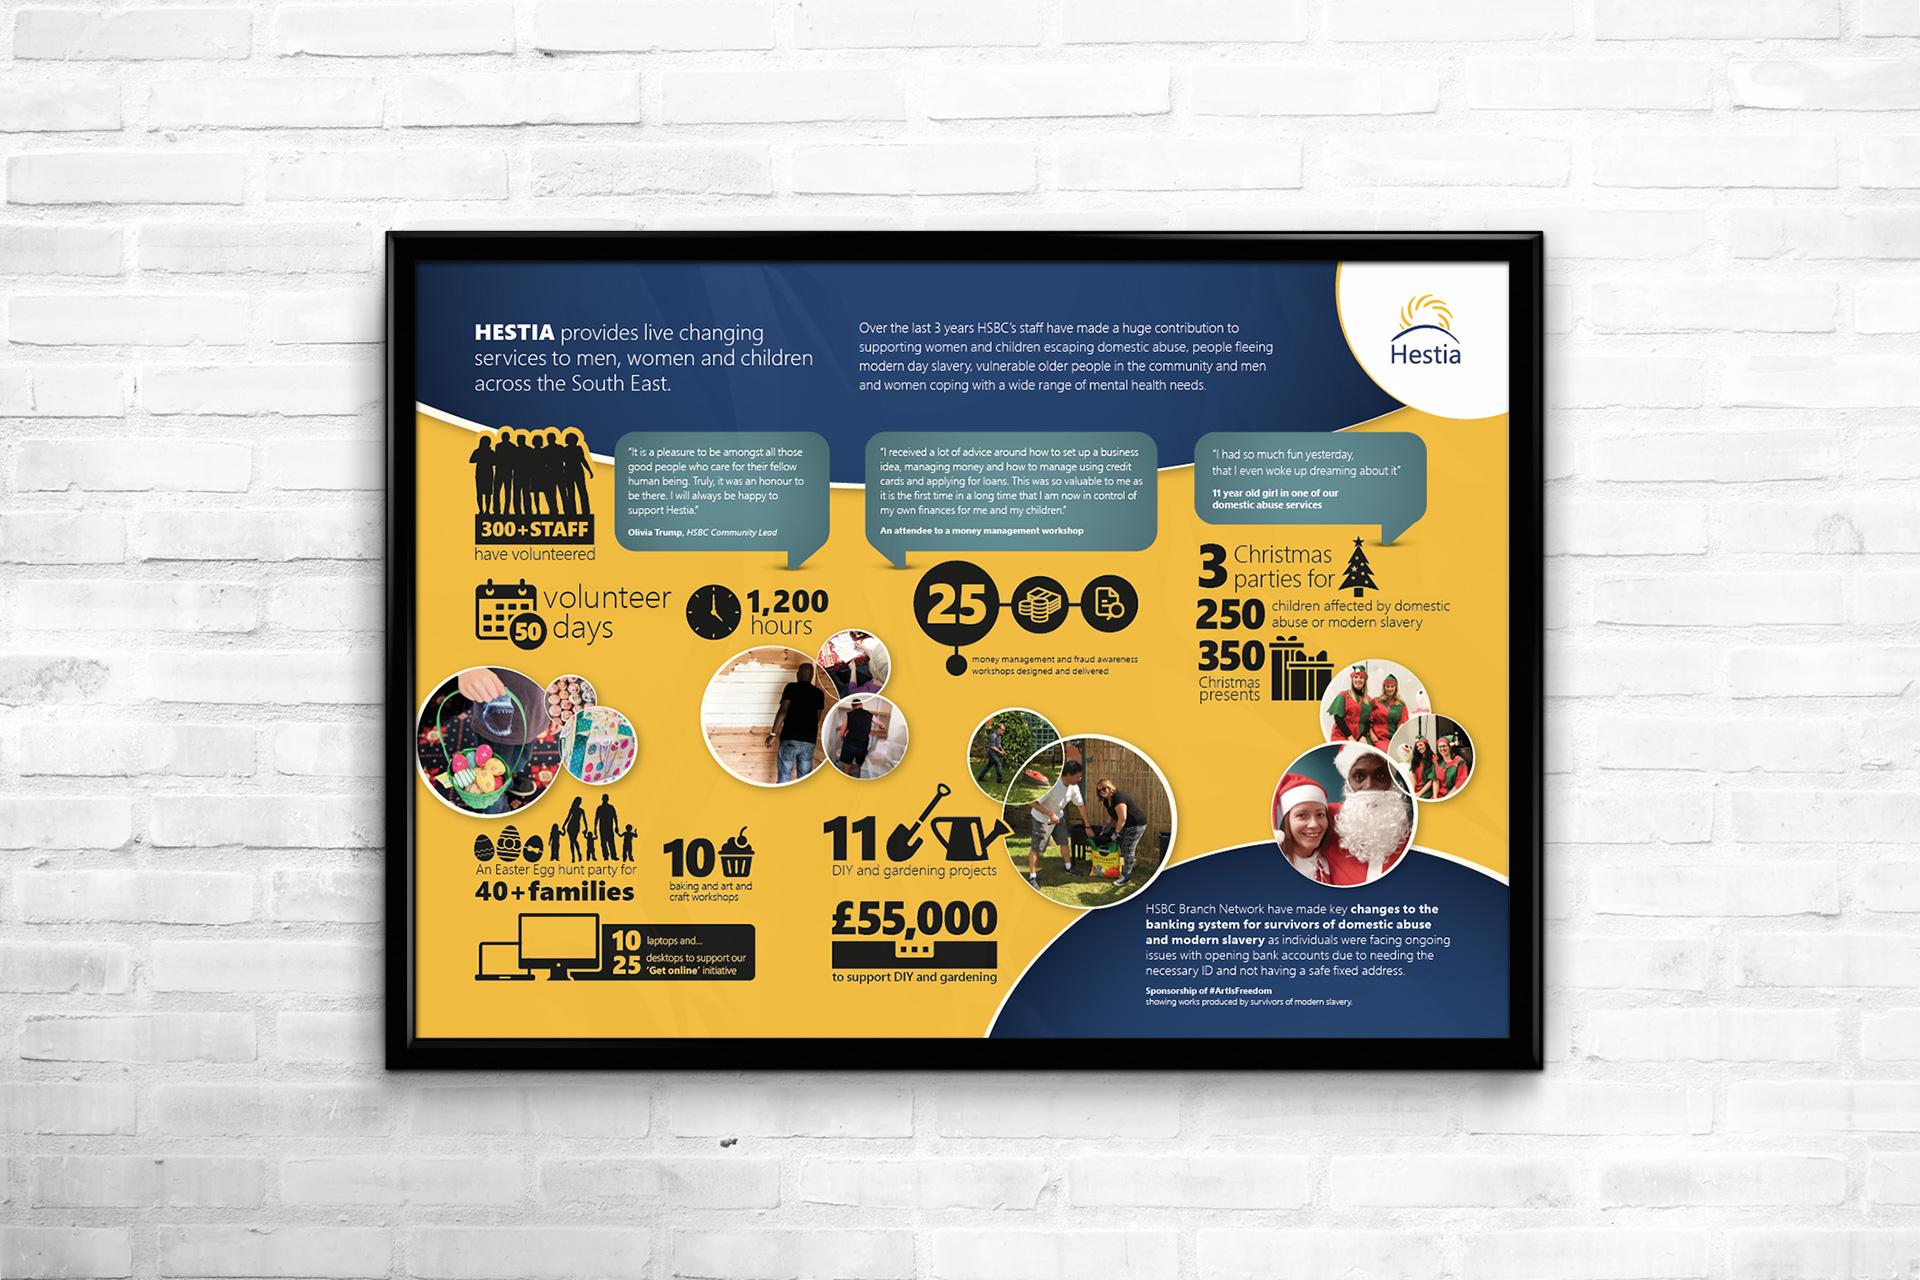 Hestia infographic poster design